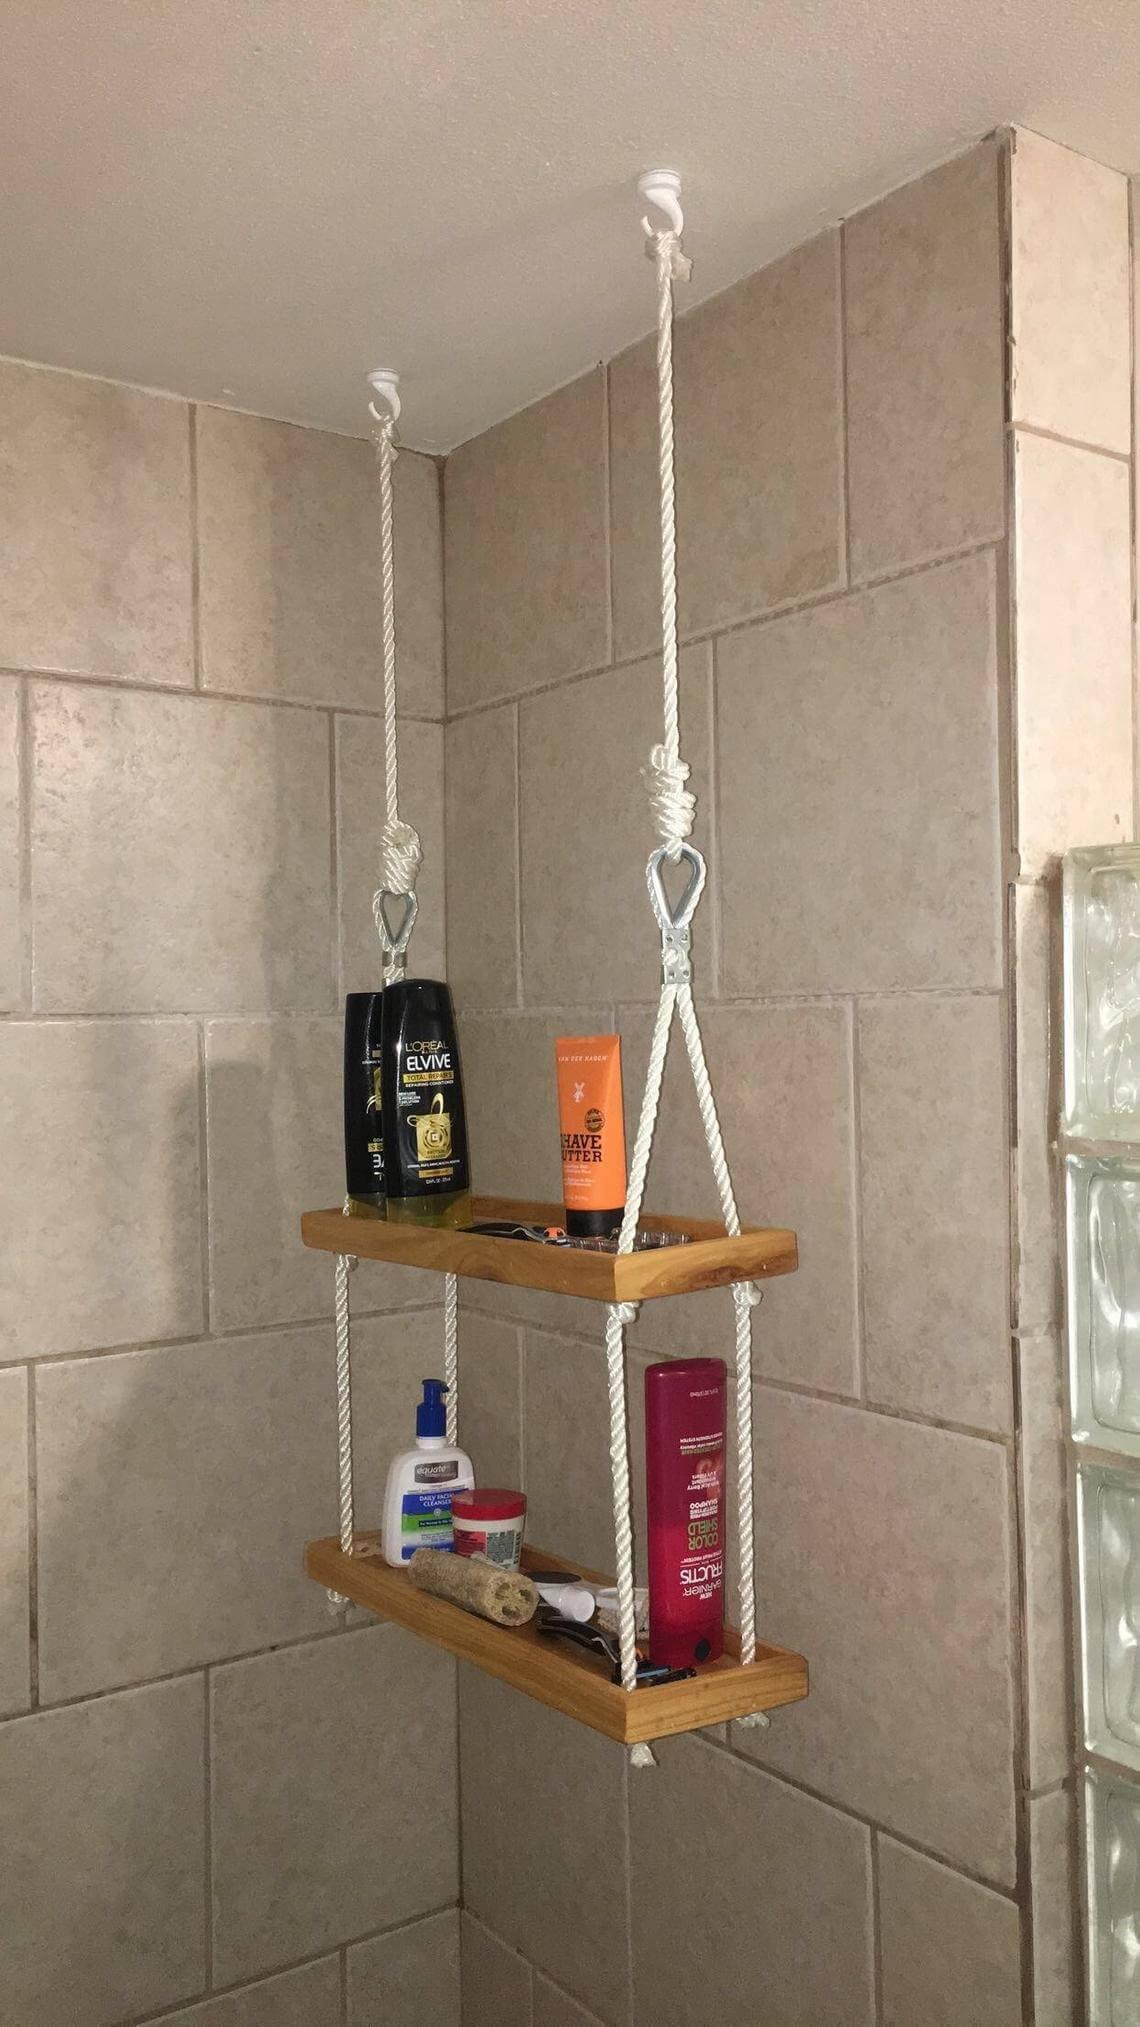 Hanging Rope and Ladder Shower Shelf